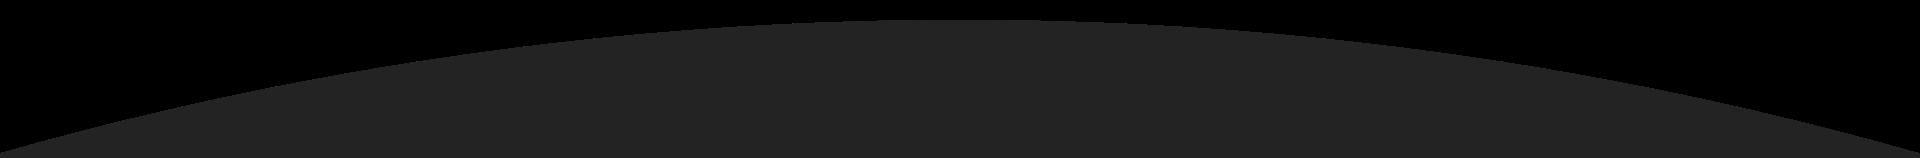 WAKSTER_Animationt_Curve_Creative2_edite